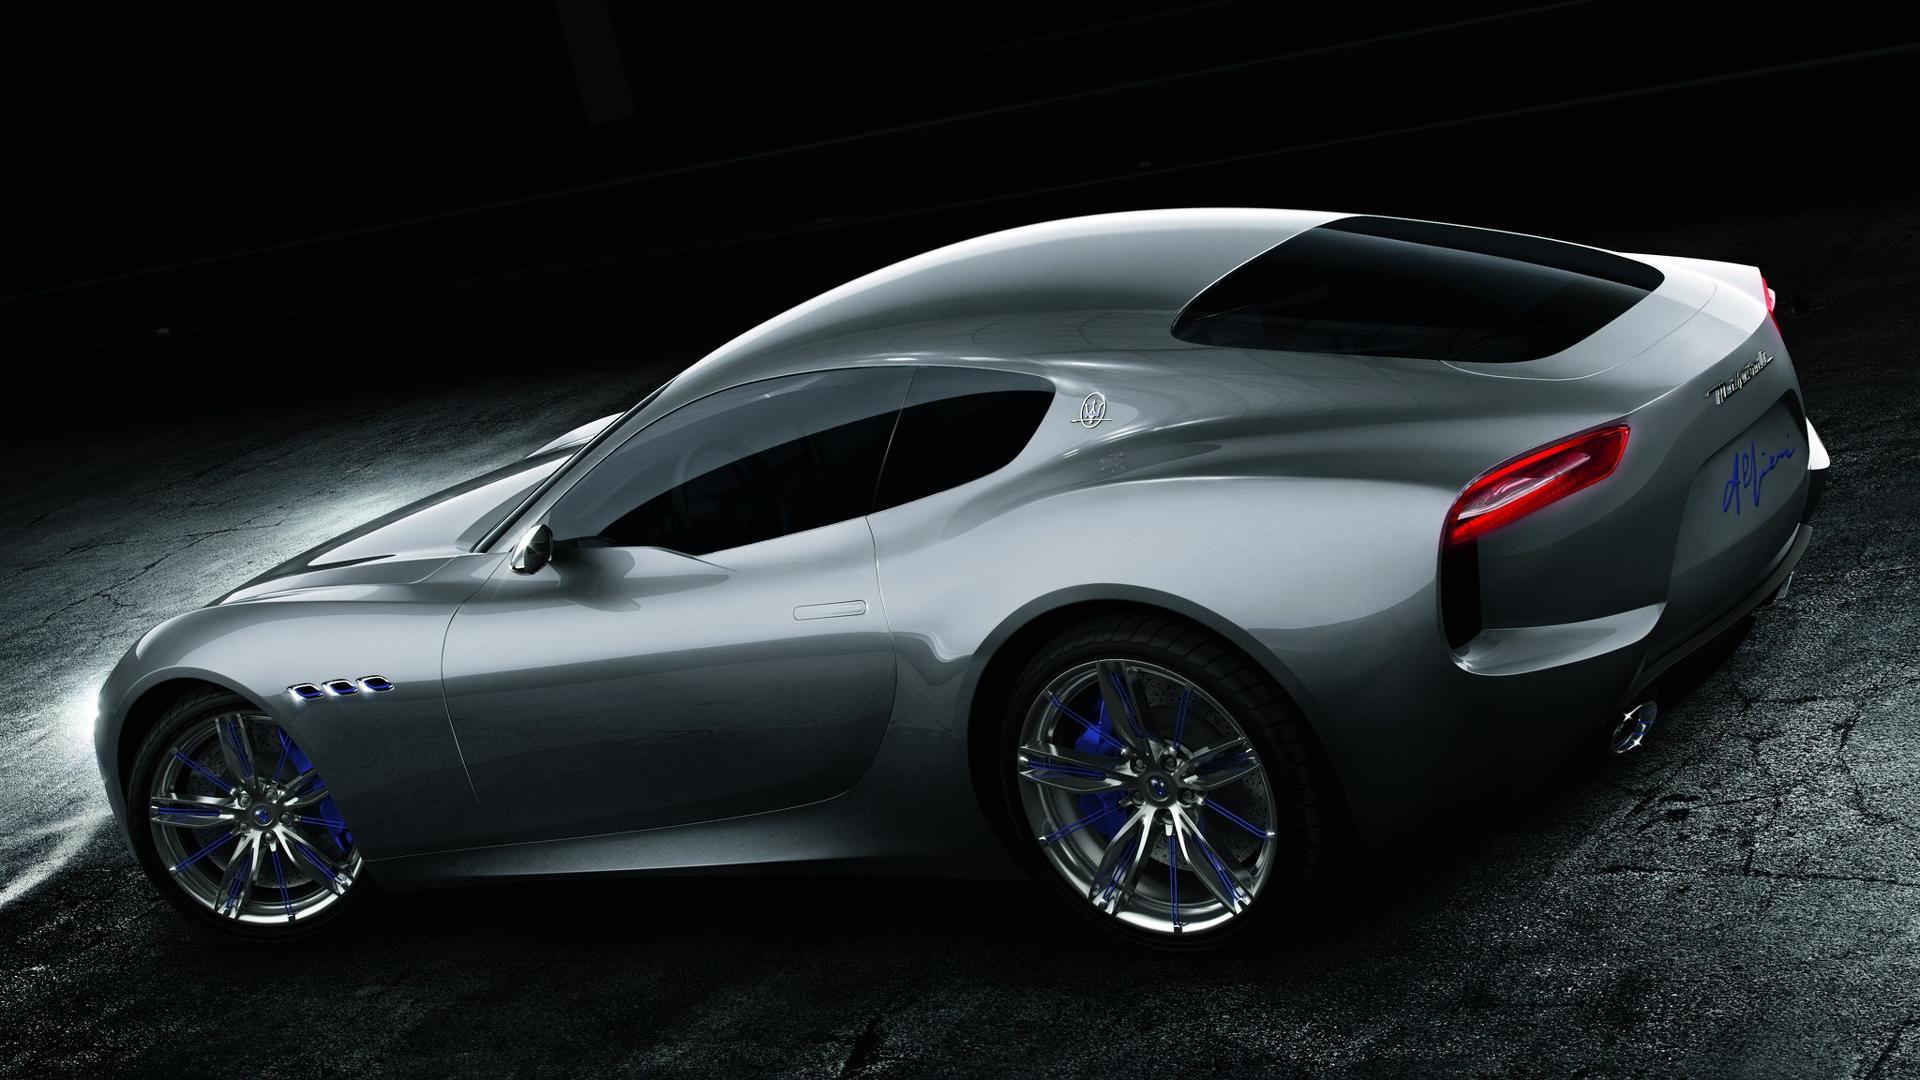 Maserati Alfieri Release Date >> Maserati Alfieri Rendered With Concept Cues Ahead Of 2020 Launch